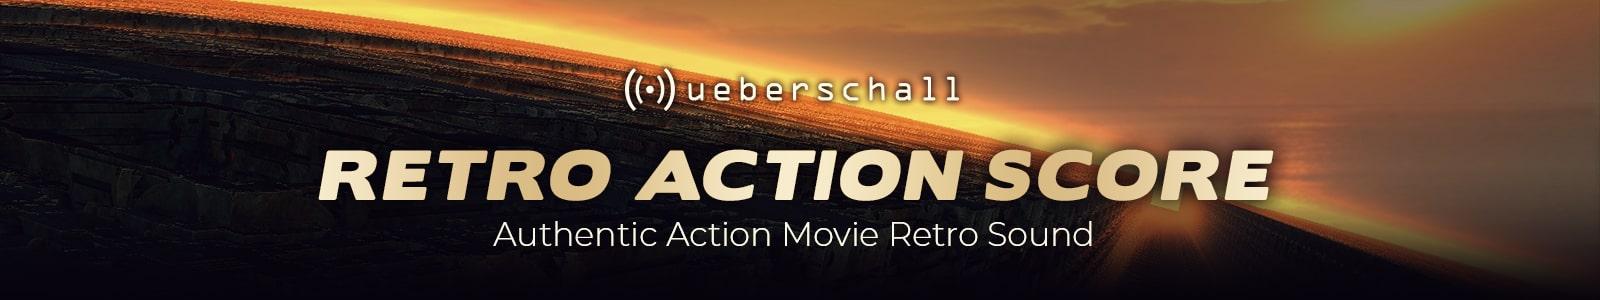 retro action score by ueberschall